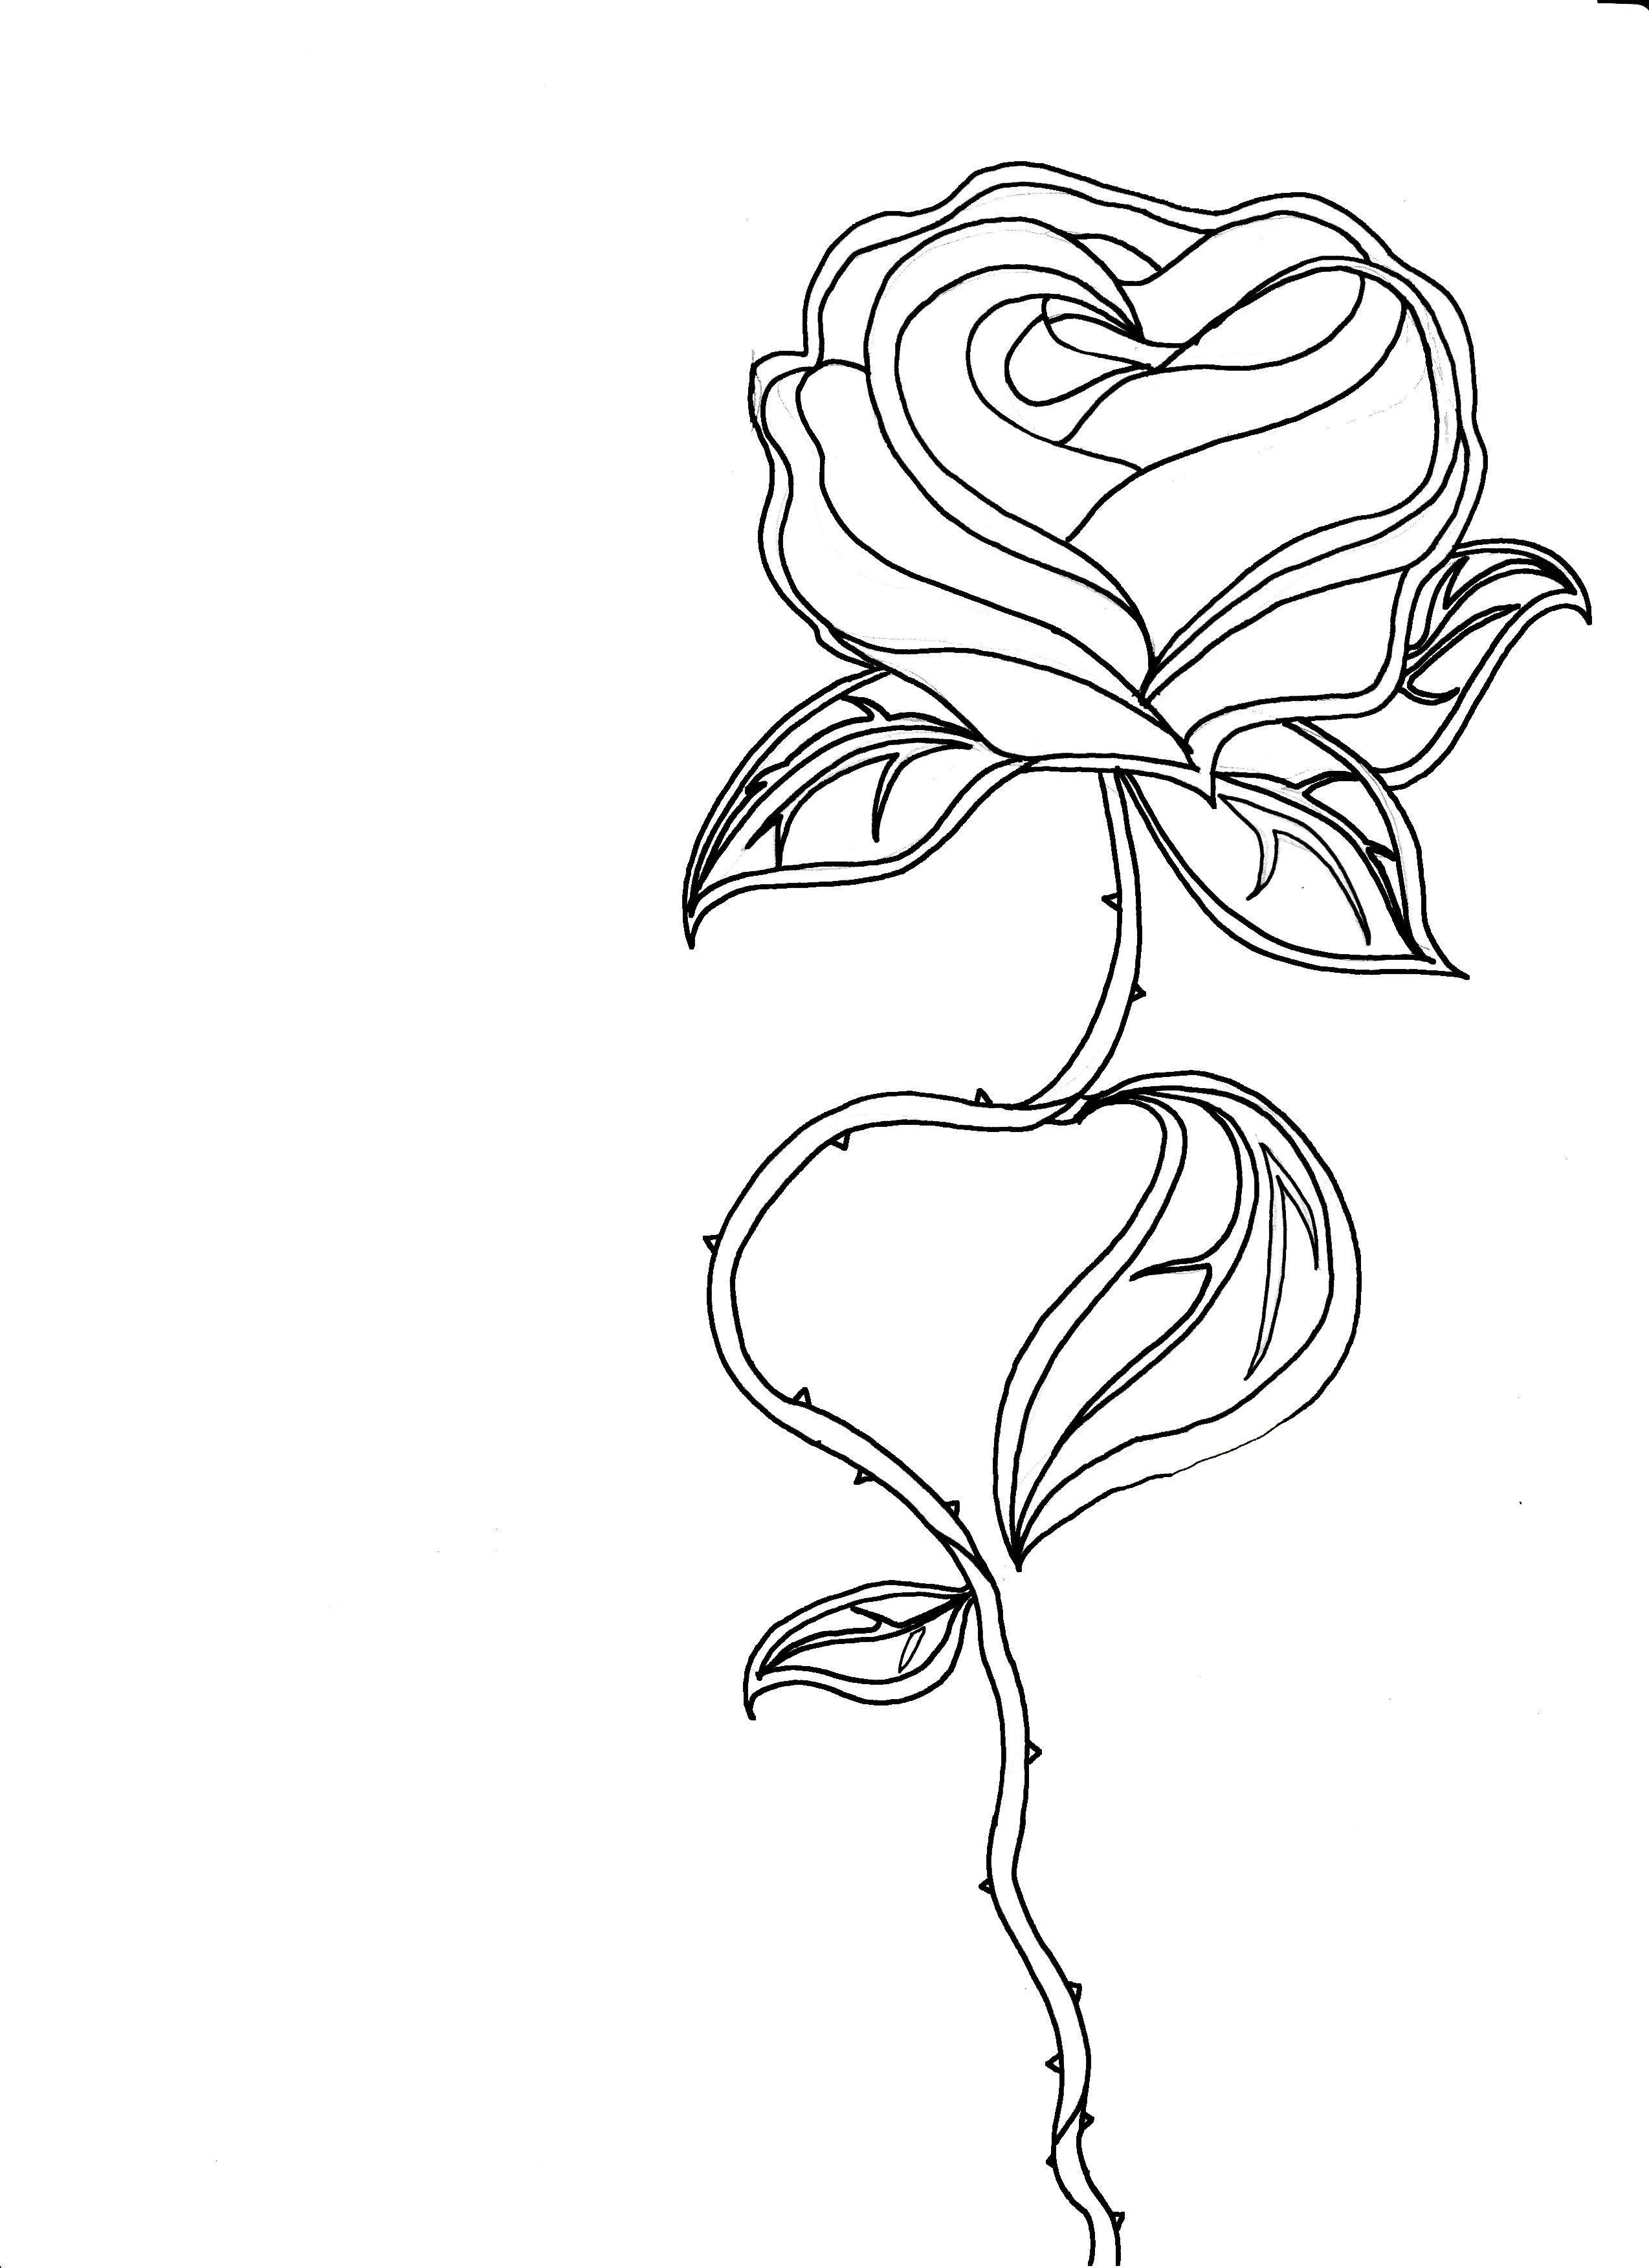 Similar Galleries Simple Flower Outline Simple Rose Outline Rose Outline Flower Outline Rose Outline Tattoo